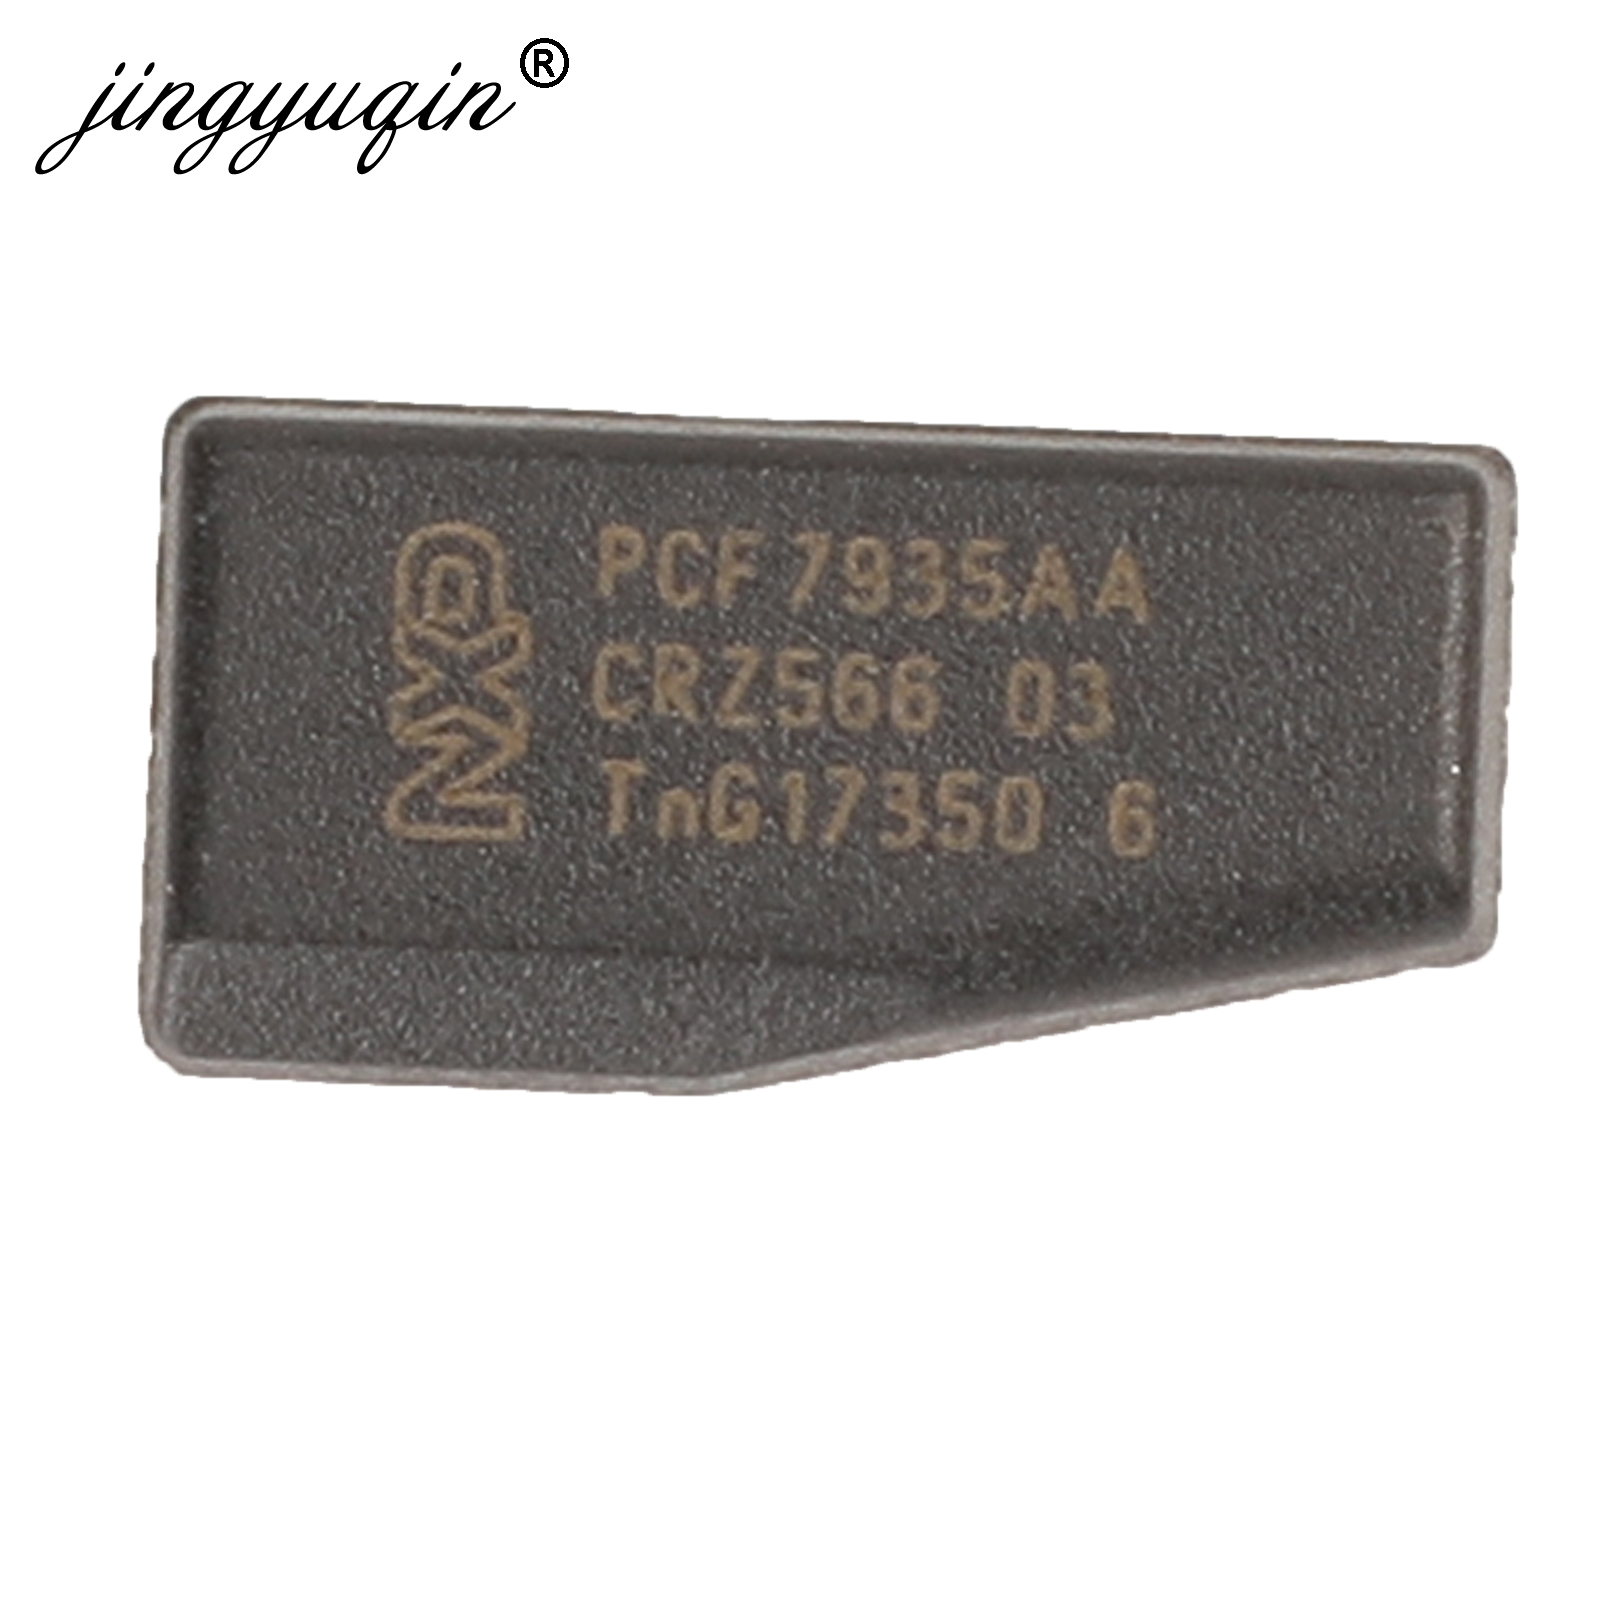 jingyuqin 5 pcs lote chip de chave do carro id44 44 pcf7935aa id chip de transponder